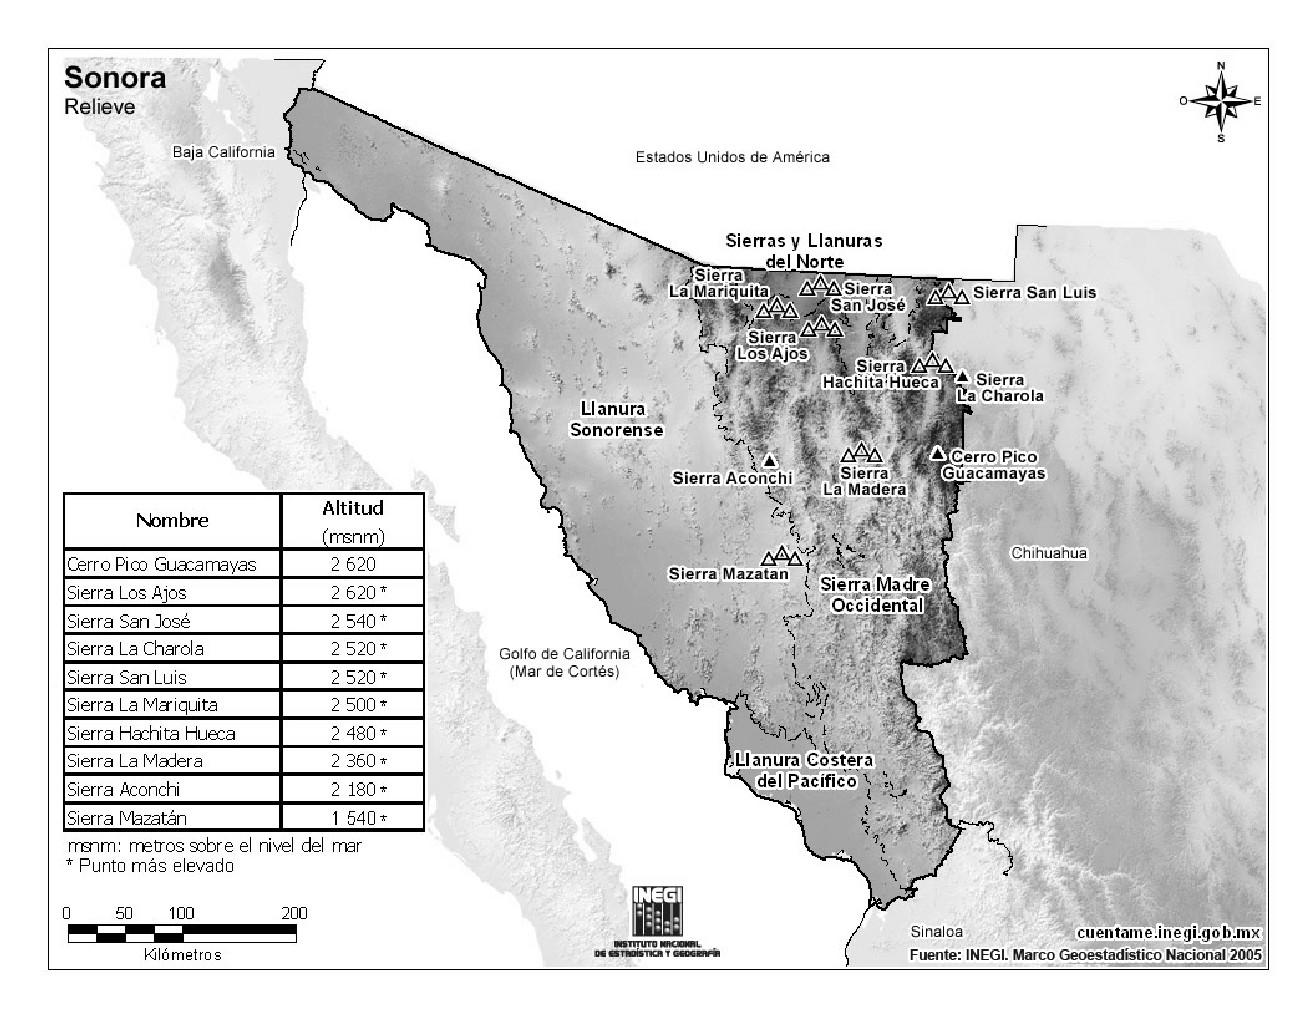 Mapa de montañas de Sonora. INEGI de México